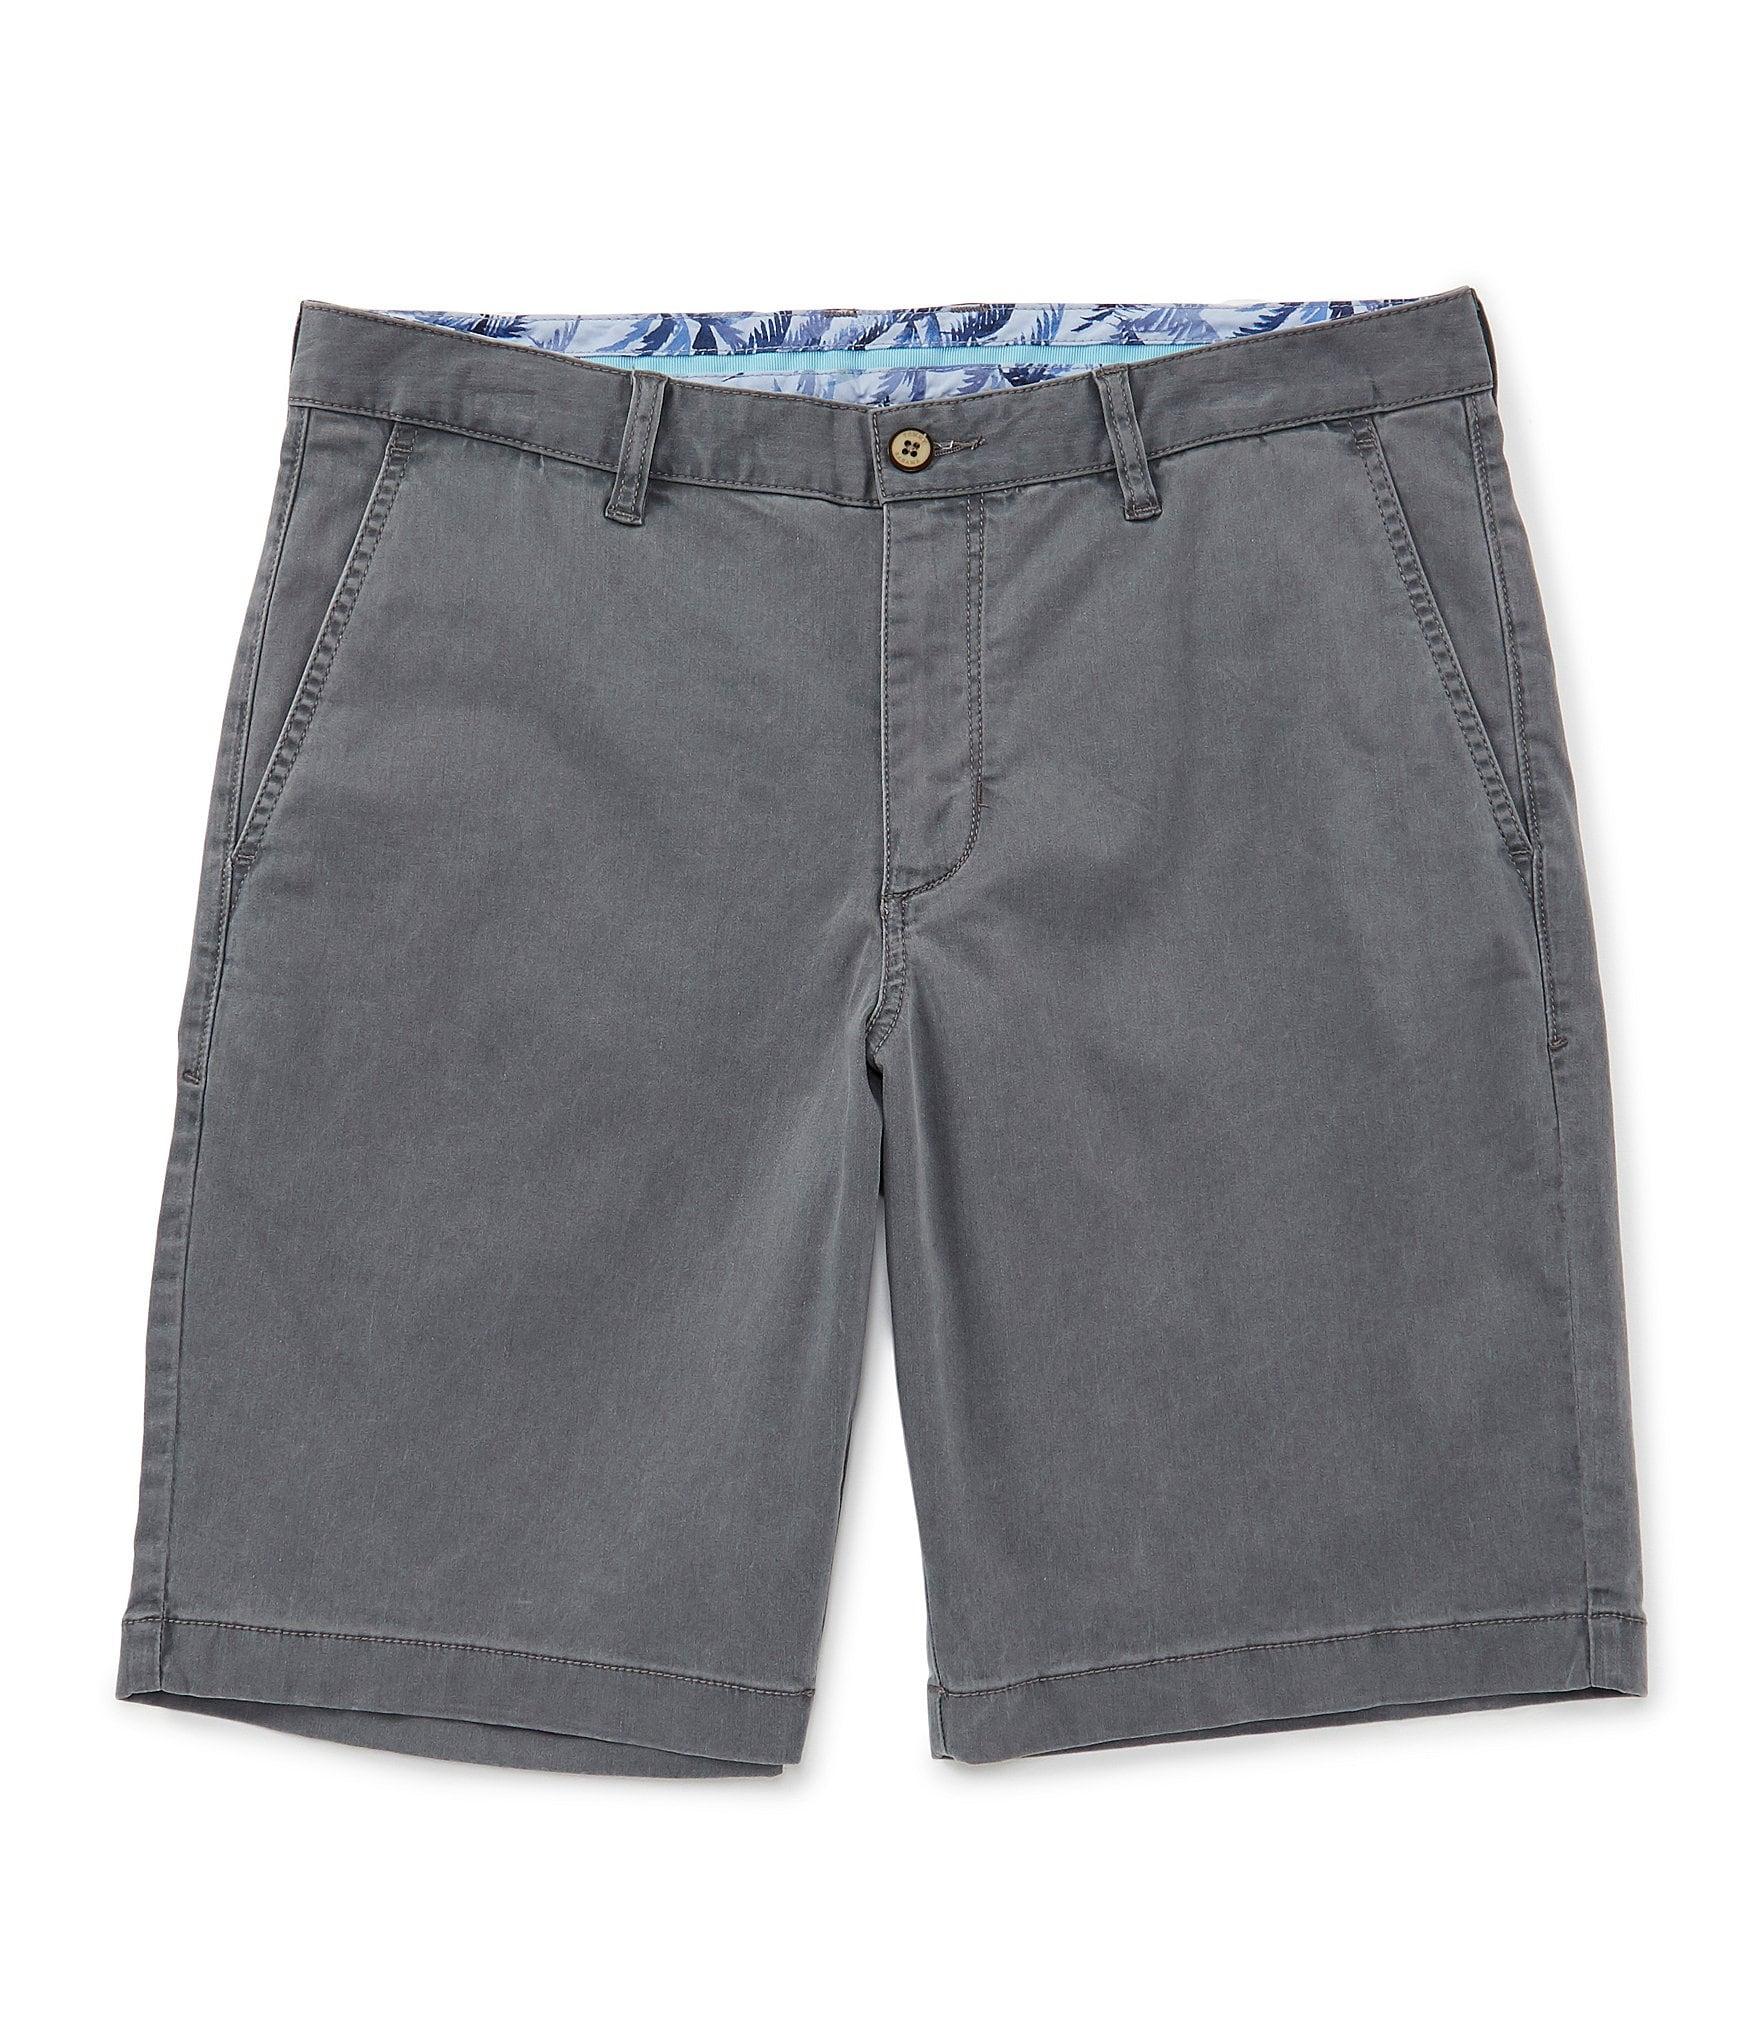 3006361f5 Men's Big and Tall Clothing | Dillard's